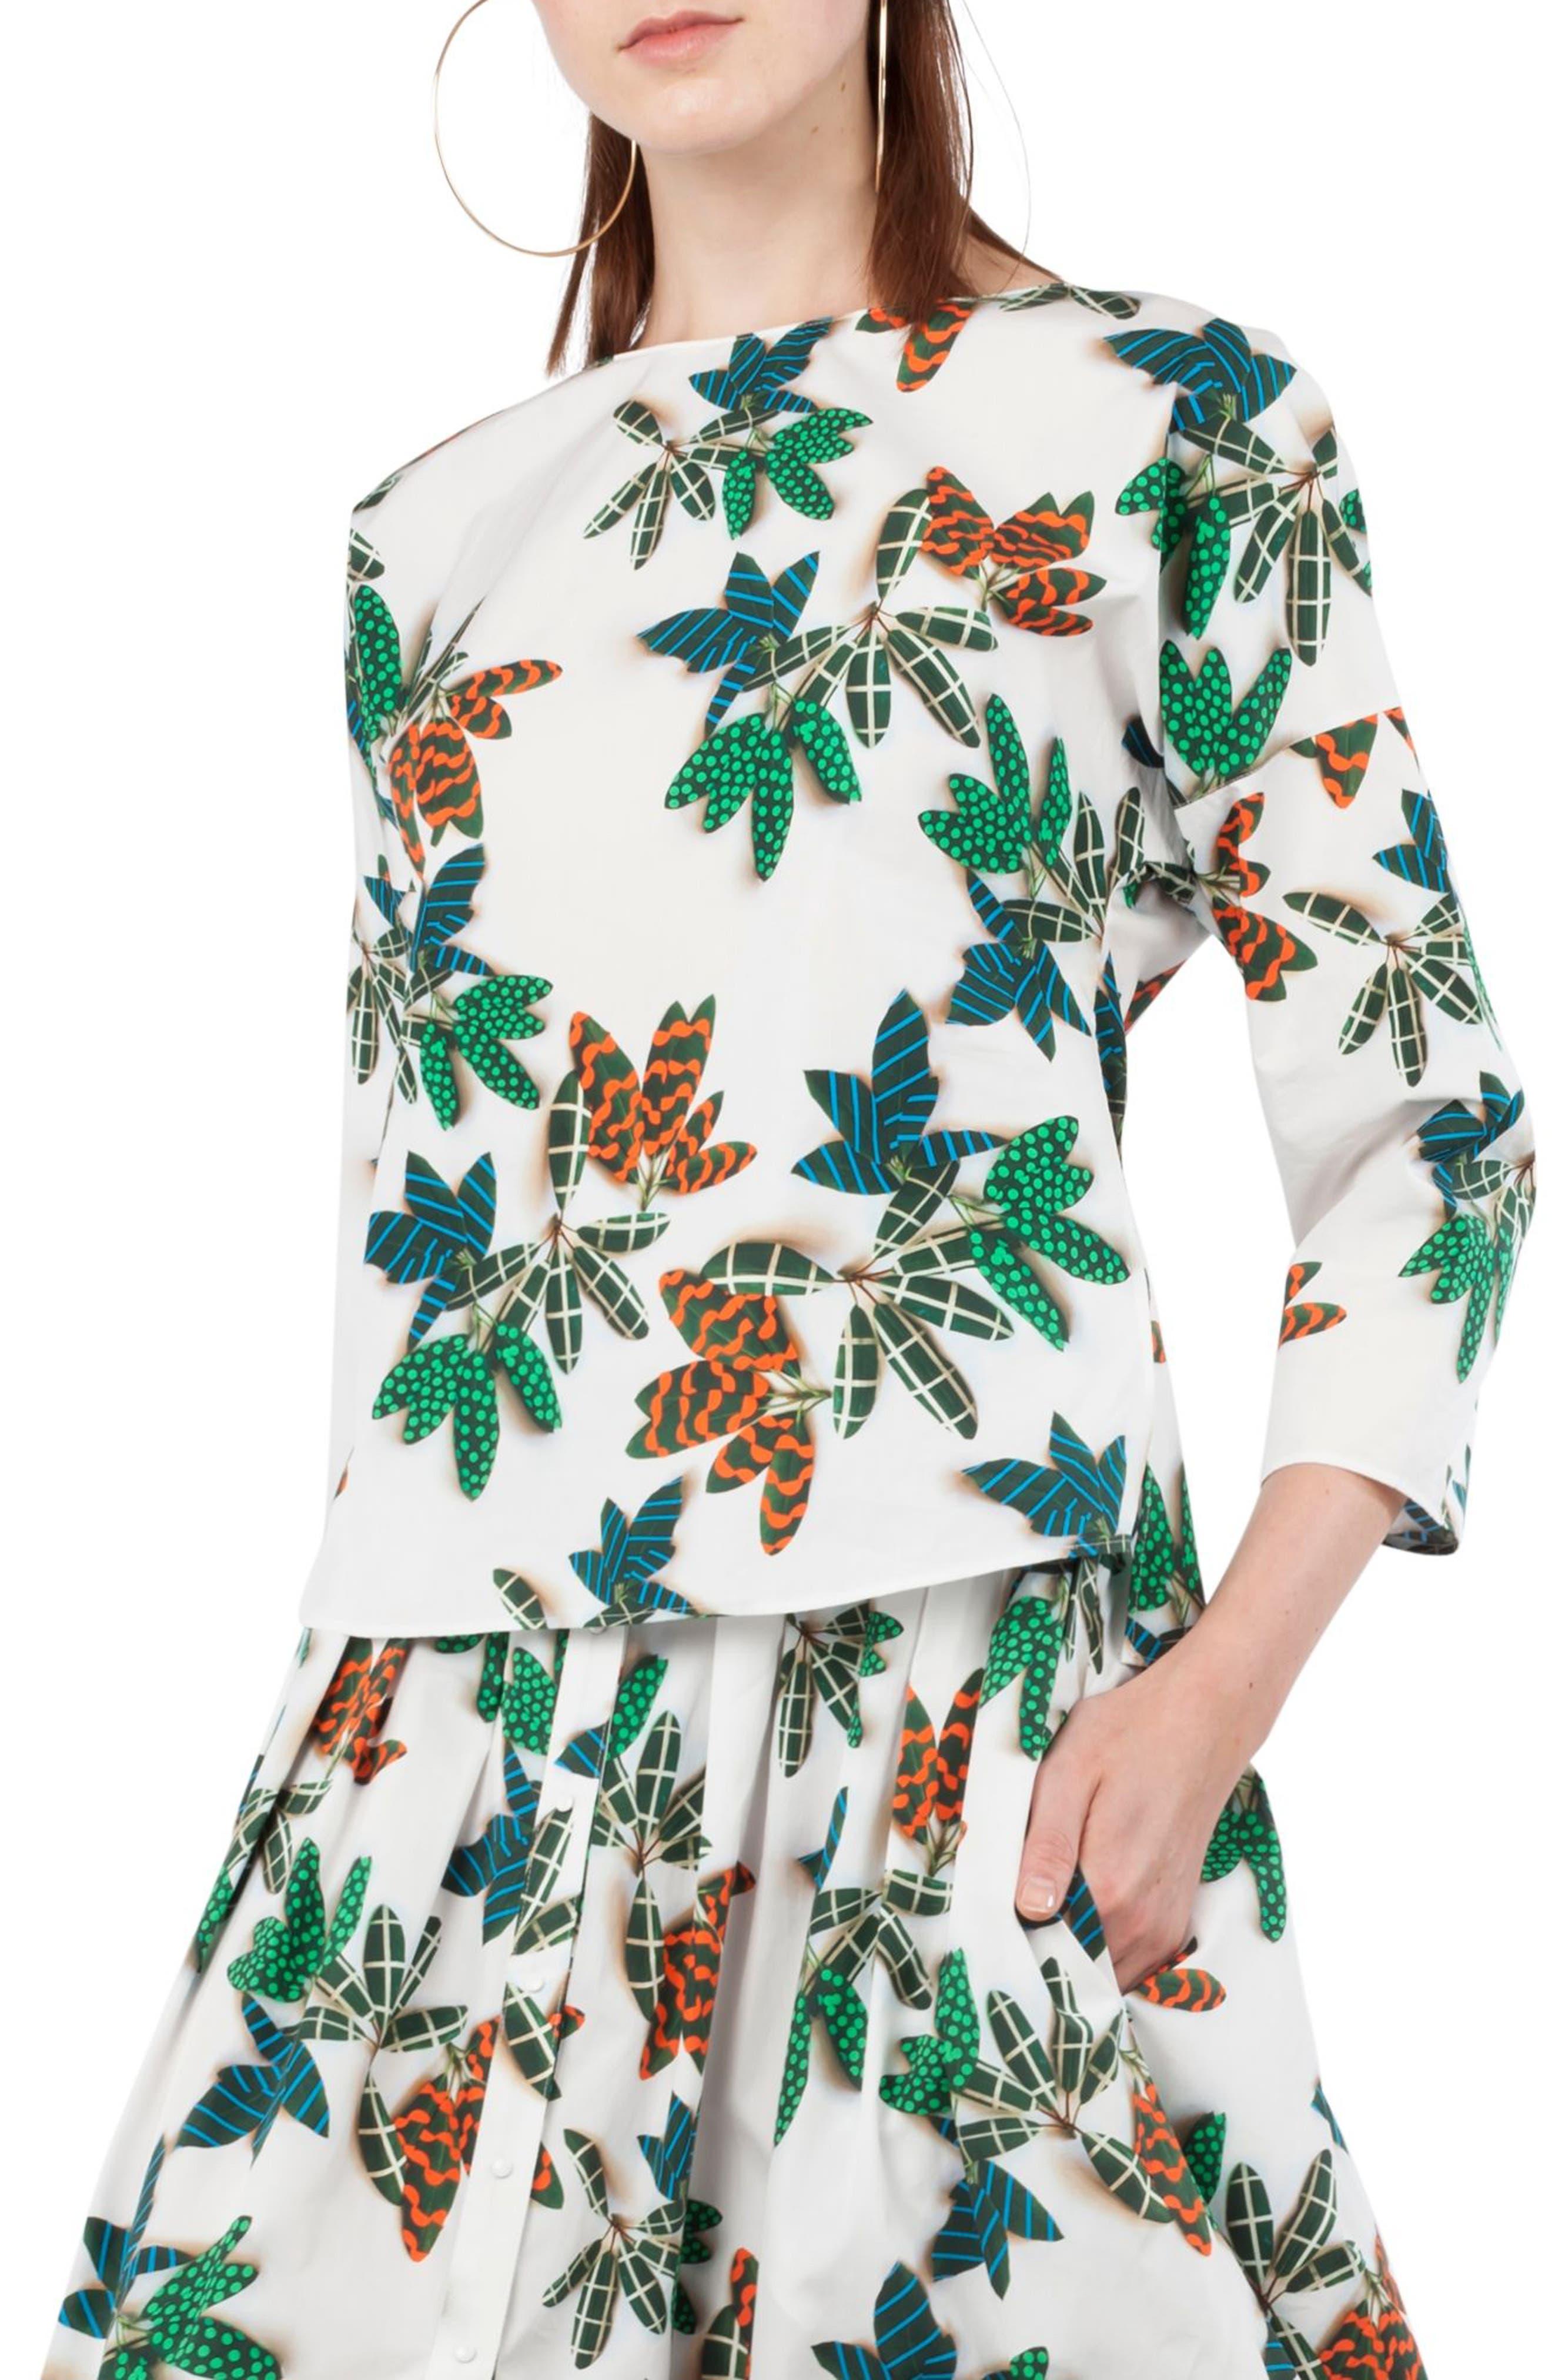 Main Image - Akris punto Tropical Print Cotton Blouse